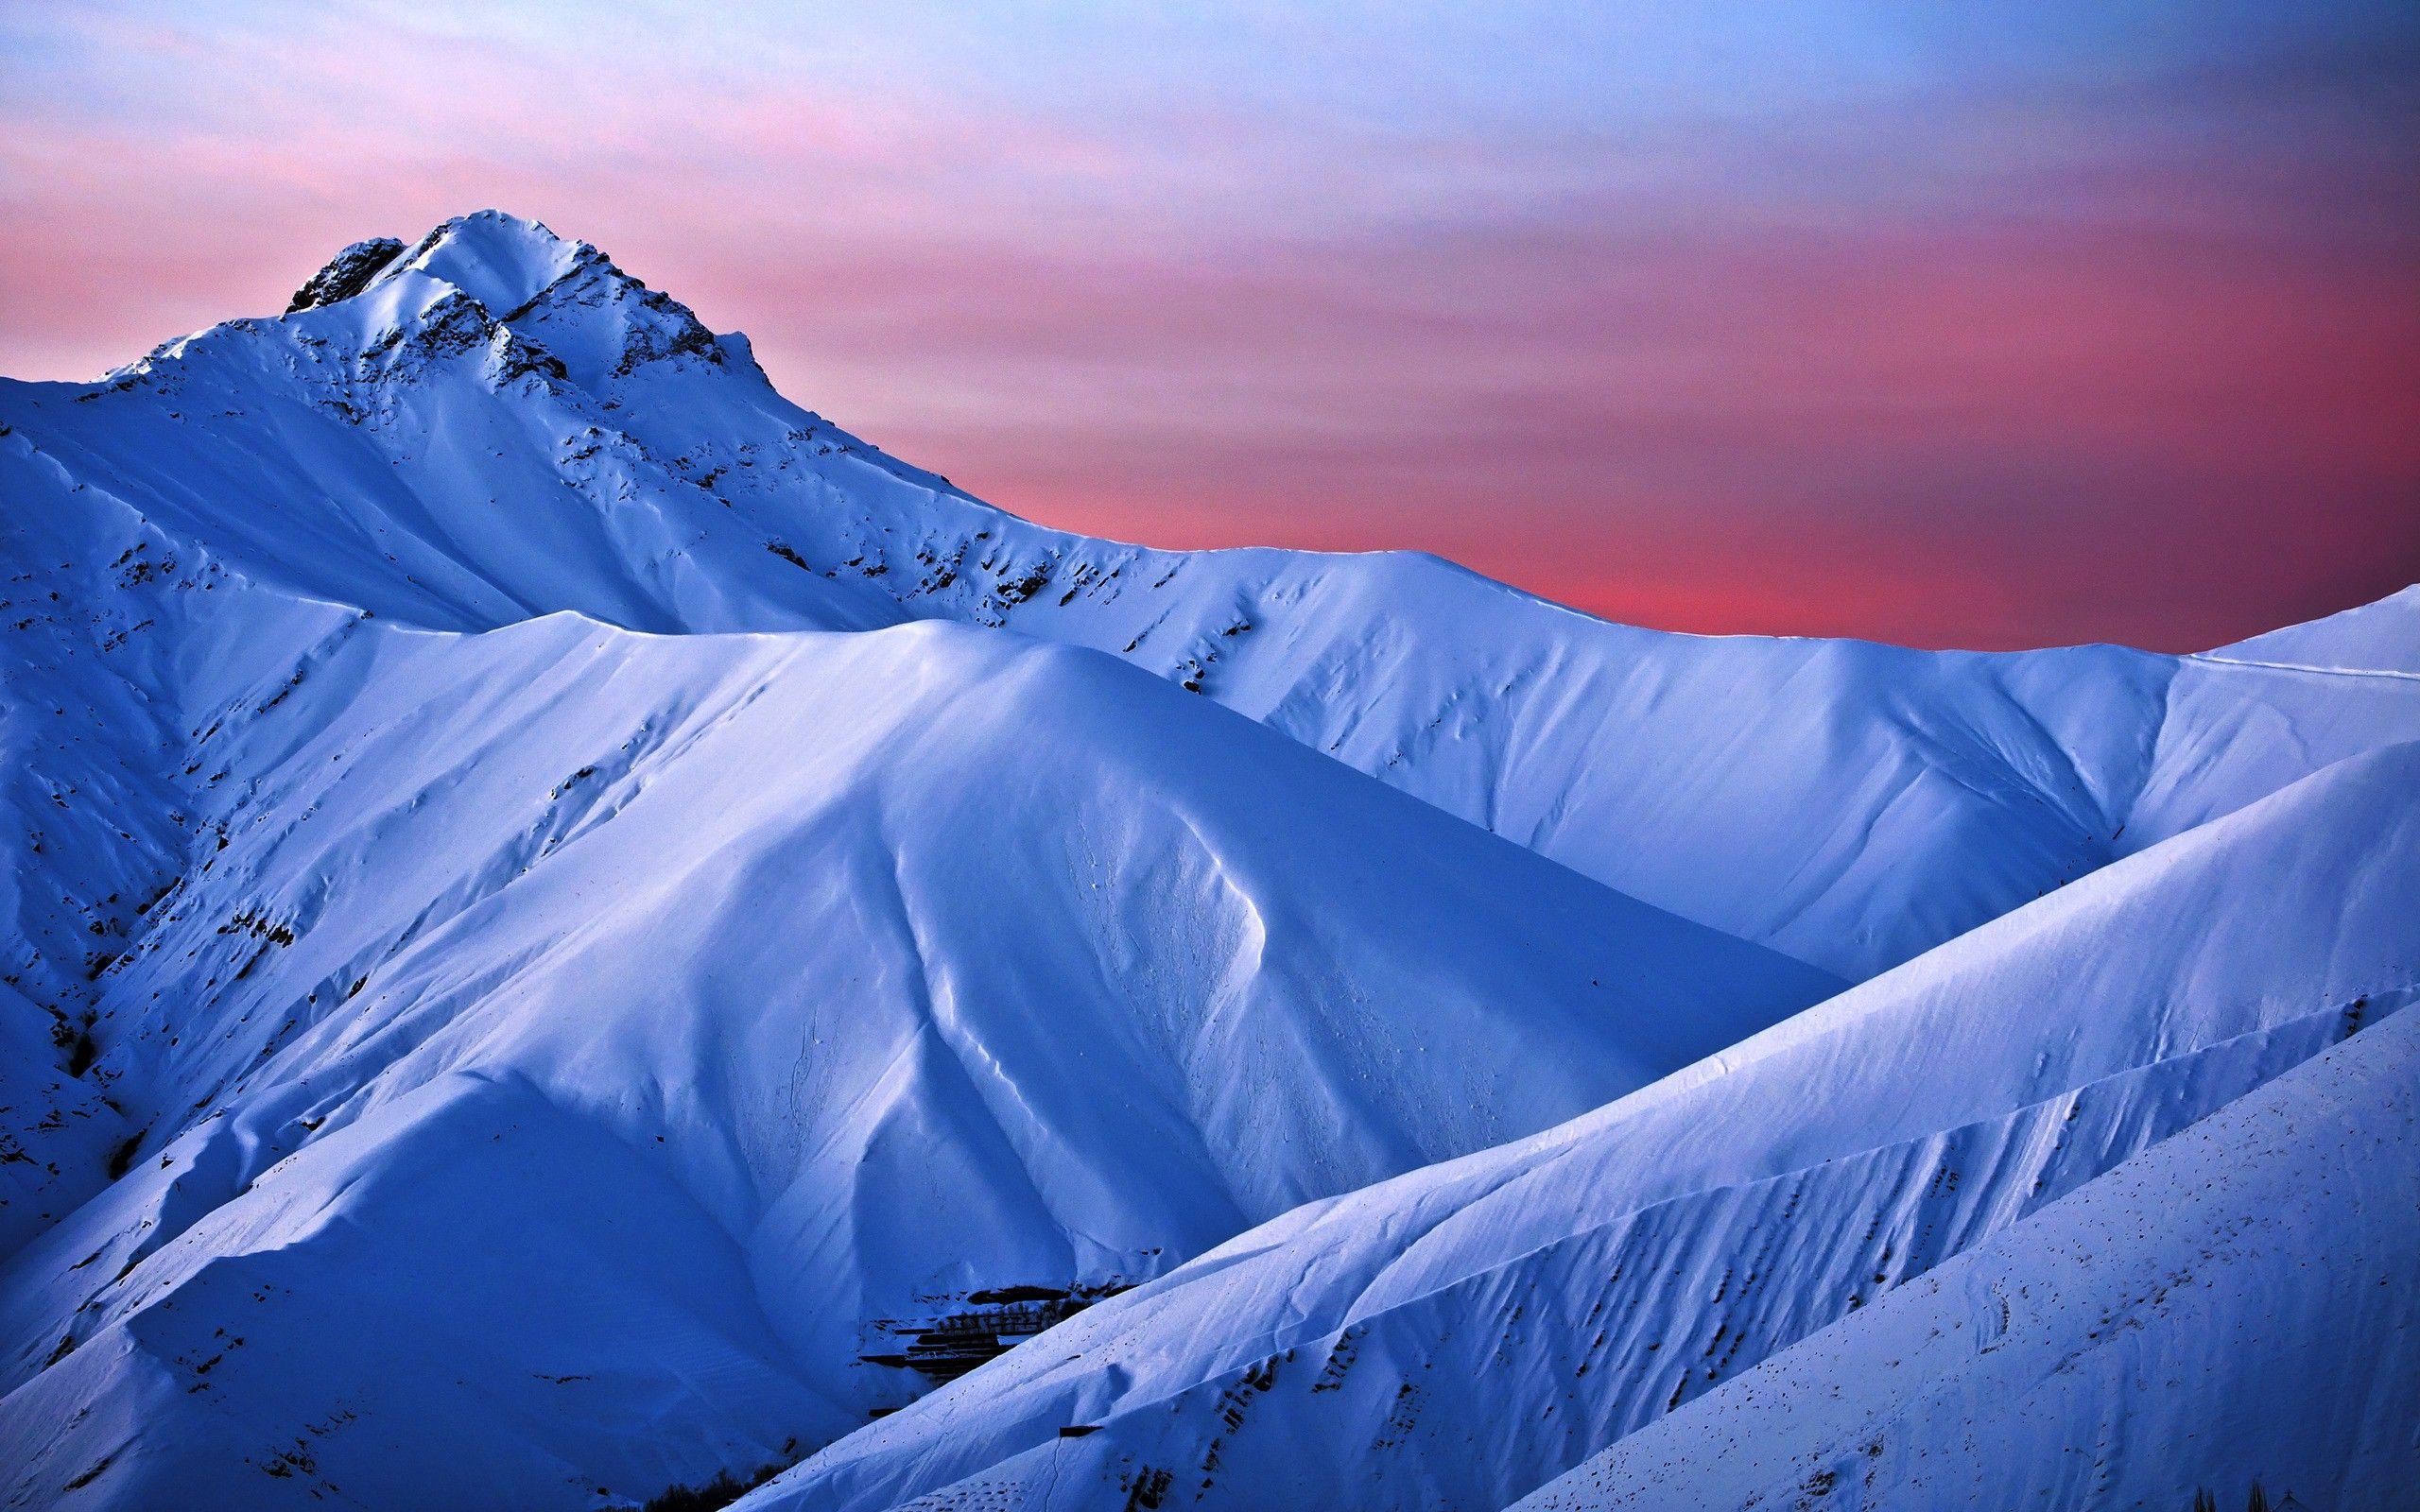 Mountain Wallpapers Free Download Hd Beautiful Amazing Big Images Mountain Wallpaper Winter Wallpaper Winter Wallpaper Desktop